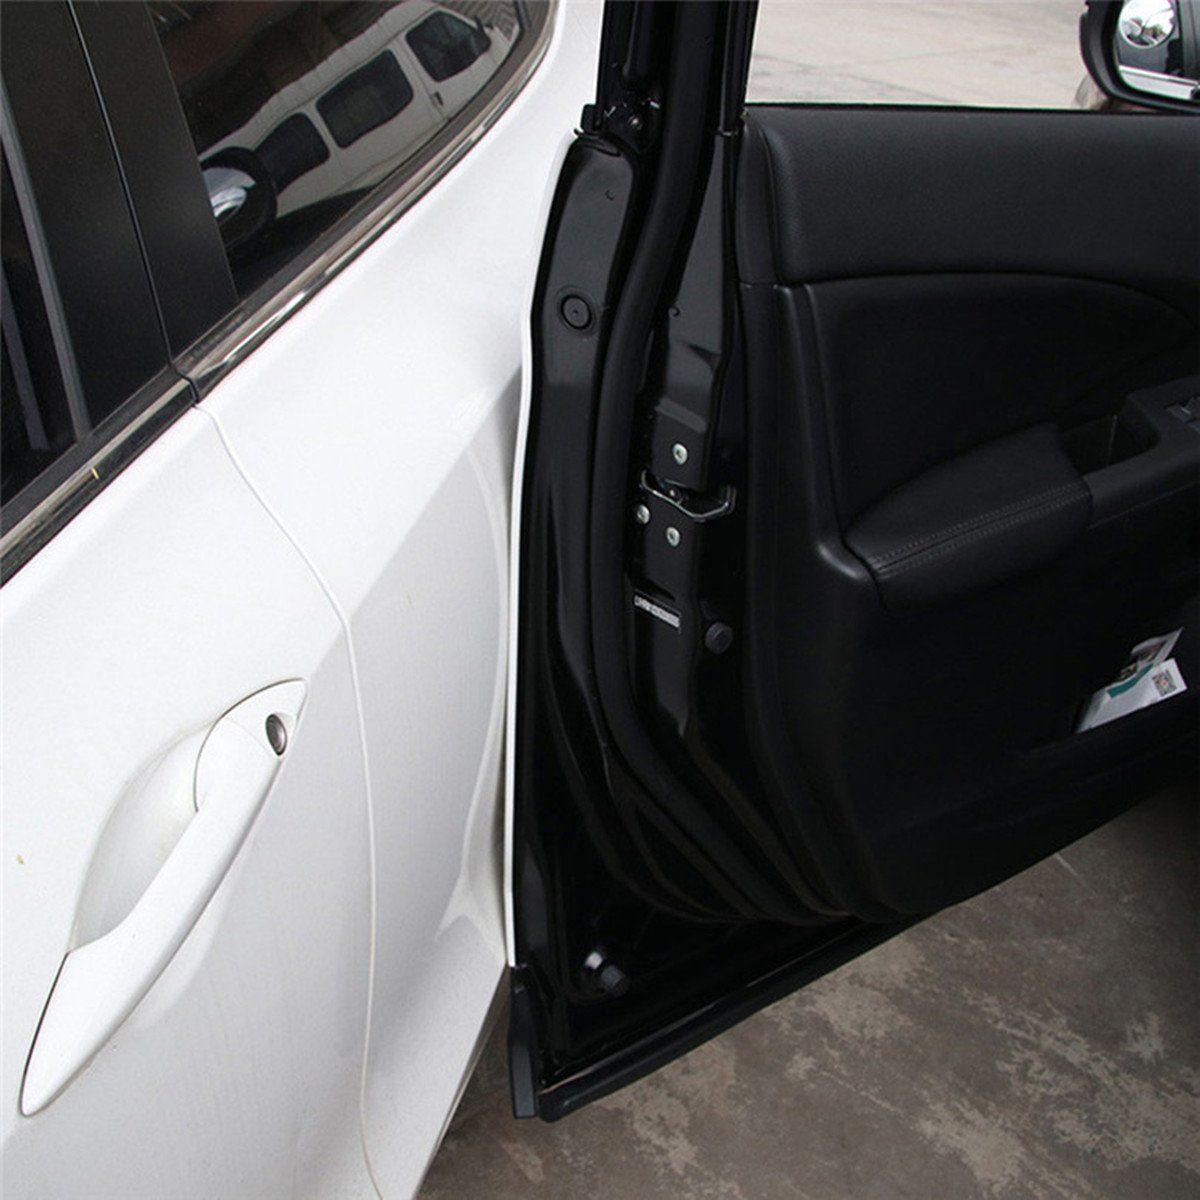 Door Edge Guard Protected Lining Trim Molding Fits Most Cars Car Door Edge Guards Trim Rubber Seal Protector Gua Door Protector Moldings And Trim Black Molding